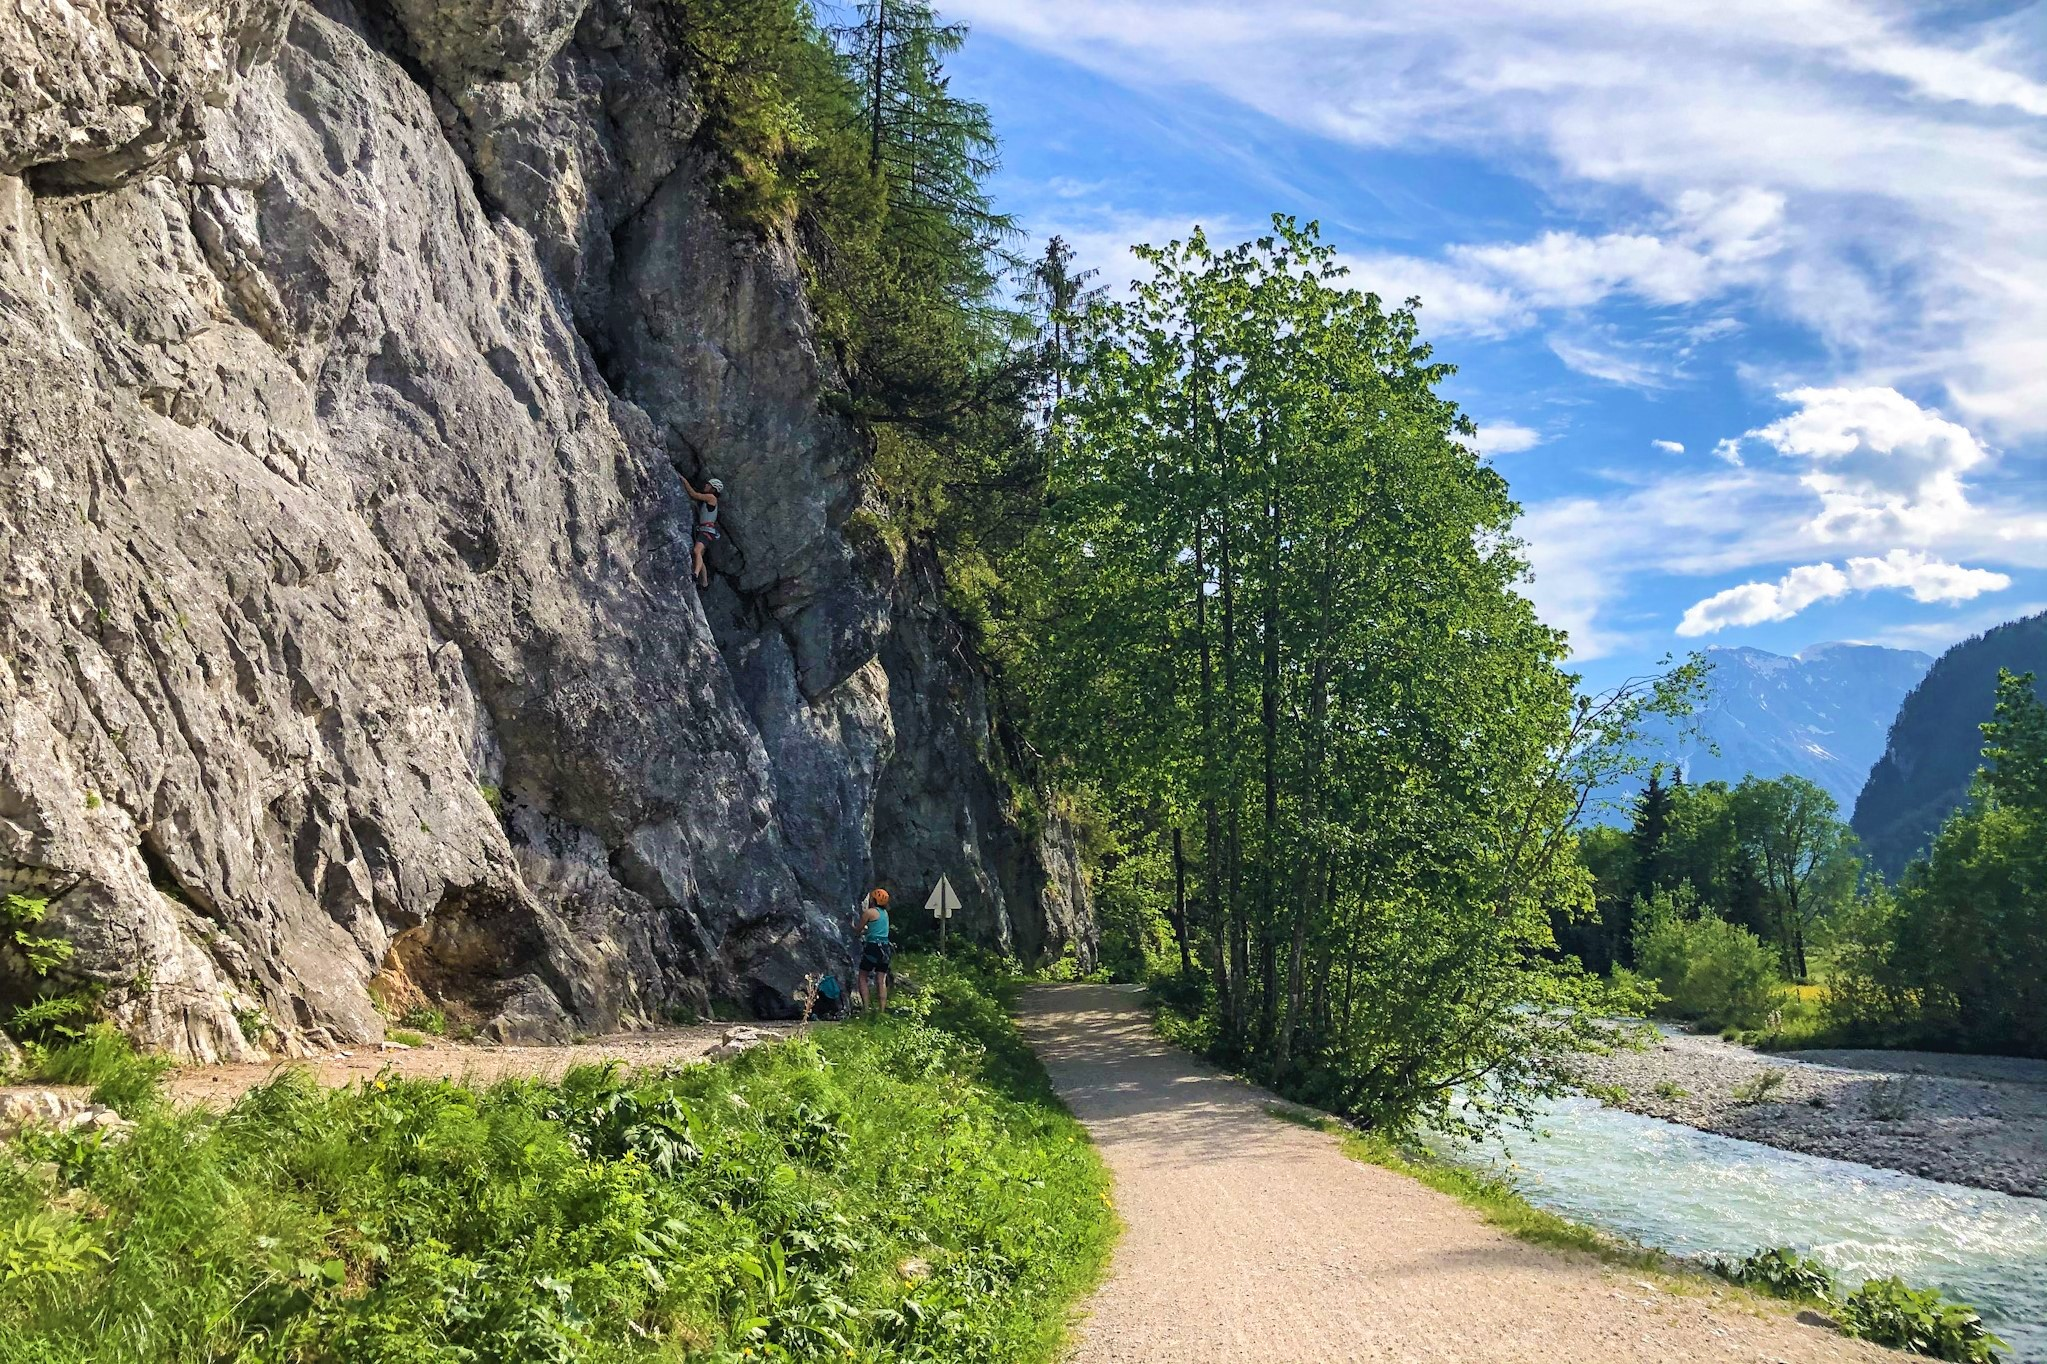 Flämenwandl-seefeld-klettern am Bach, Foto: Tessa Mellinger I Climbers Paradise